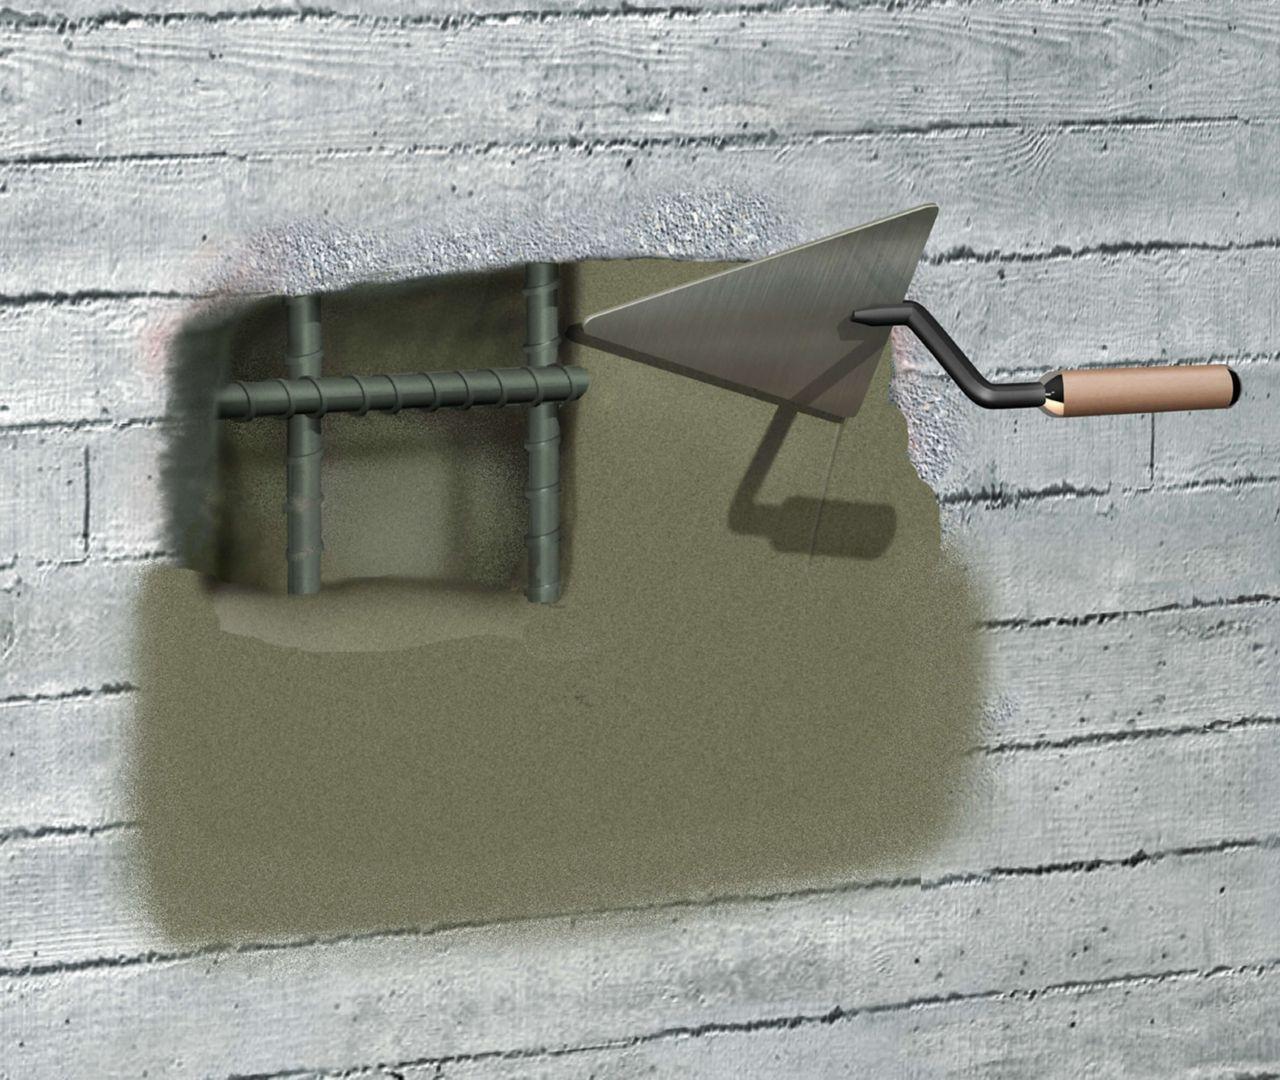 Hand applied concrete repair mortar